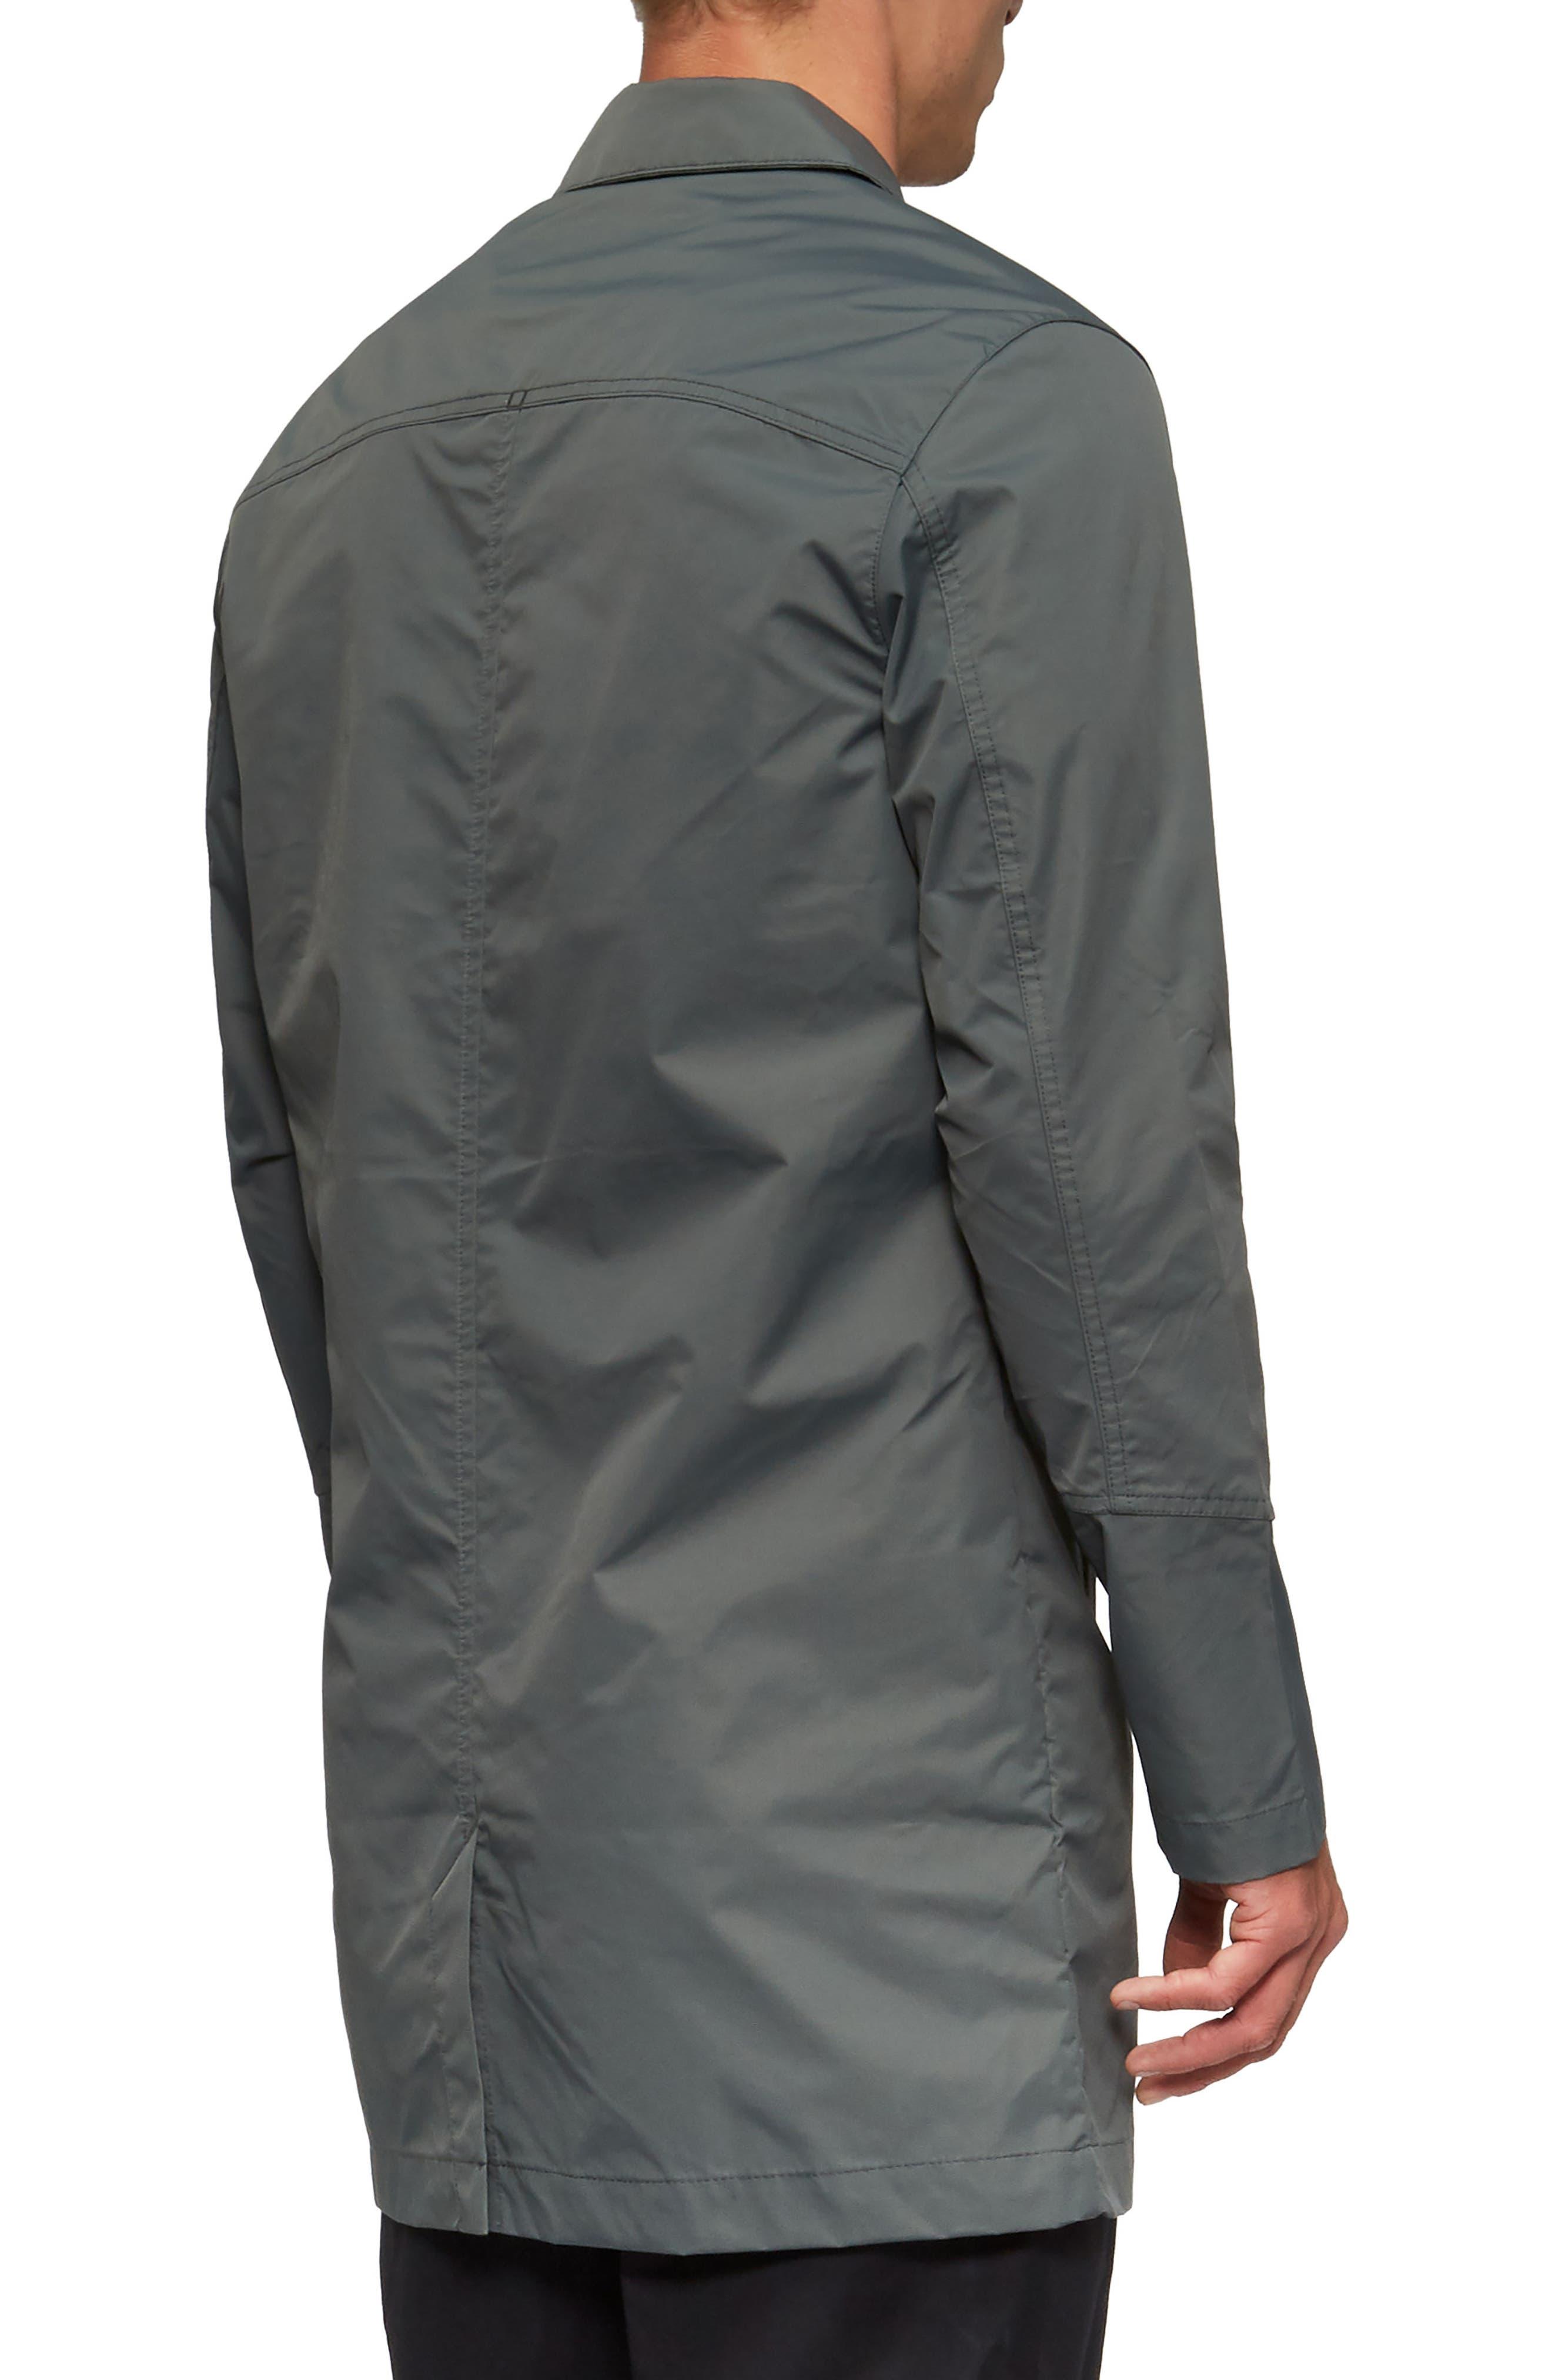 Deckard Weather Resistant Trench Coat,                             Alternate thumbnail 2, color,                             Surplus Green